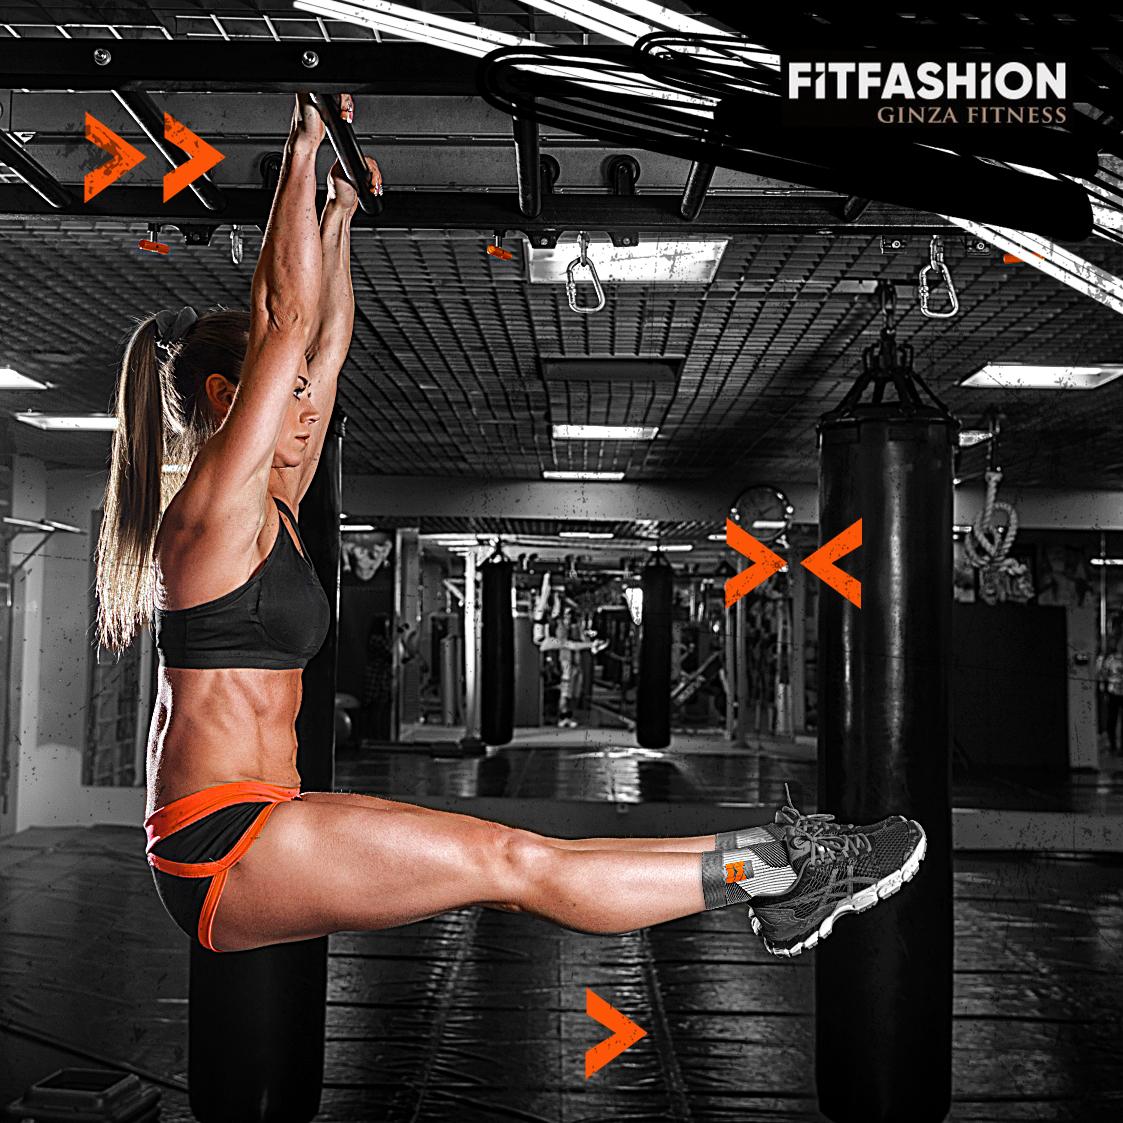 Новый партнёр FITFASHION (ginza fitness)